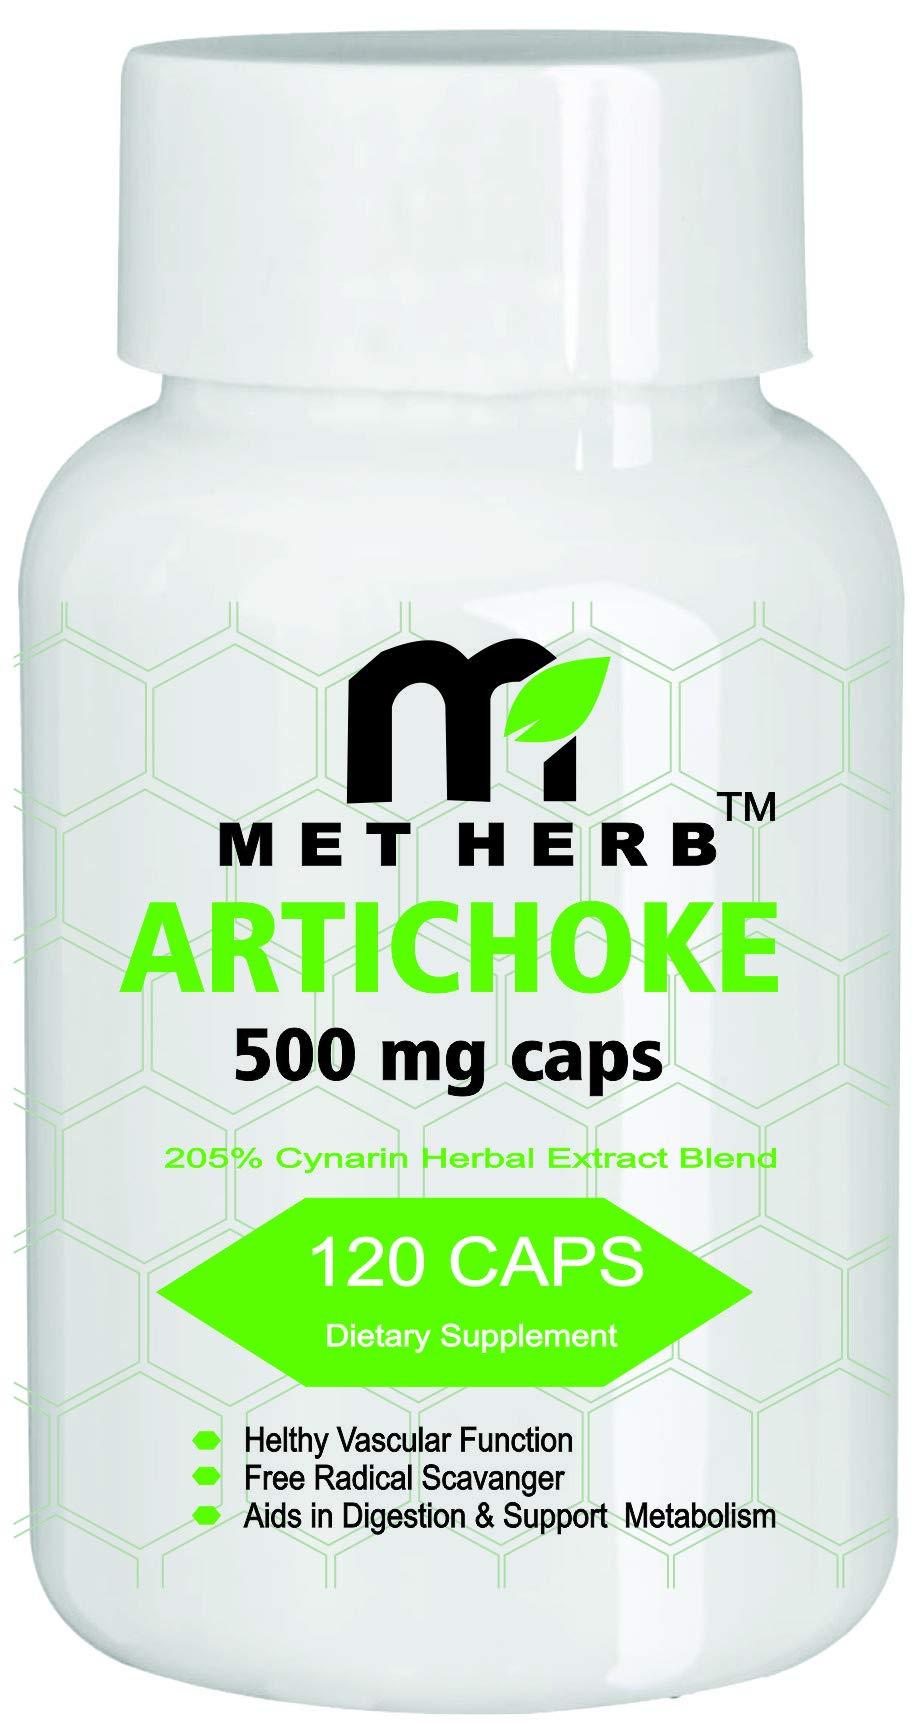 Artichoke Extract Capsule 500mg Natural Liver Detox-120 Capsule